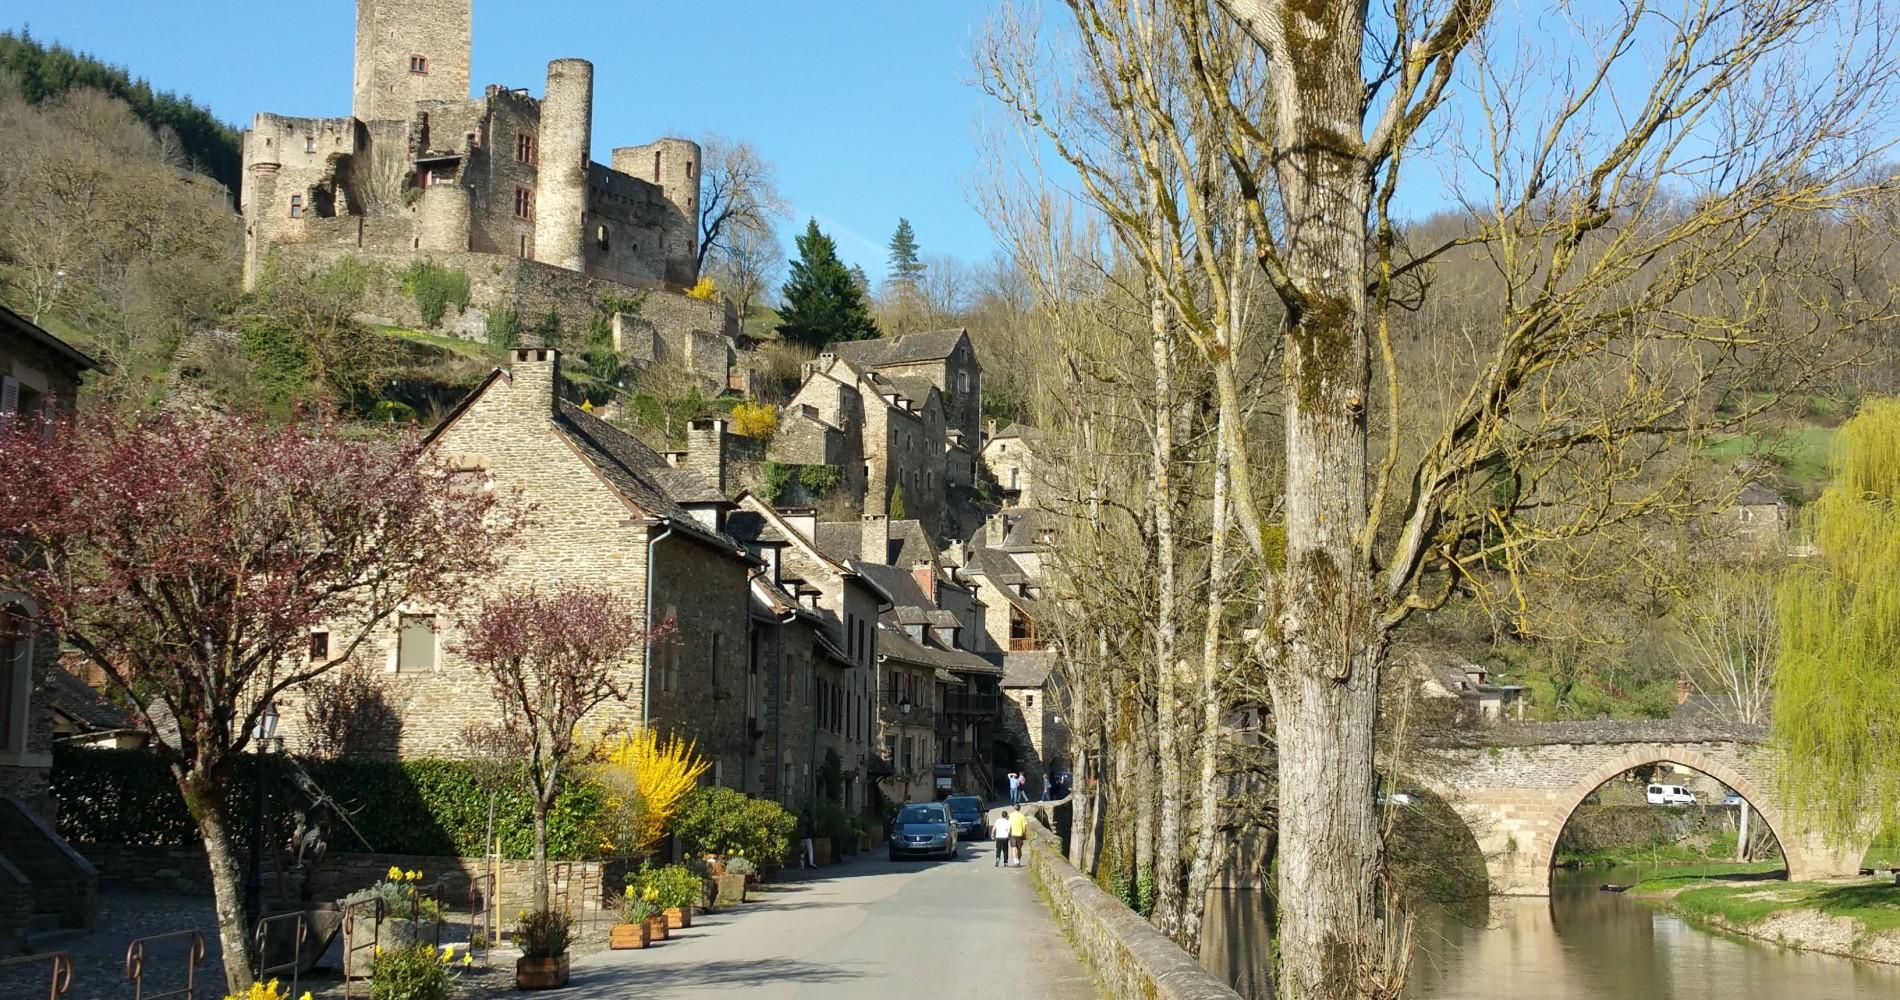 Aveyron. Belcastel. Chambre d'hote Aveyron.  Occitanie. Etape VRP. Chateau